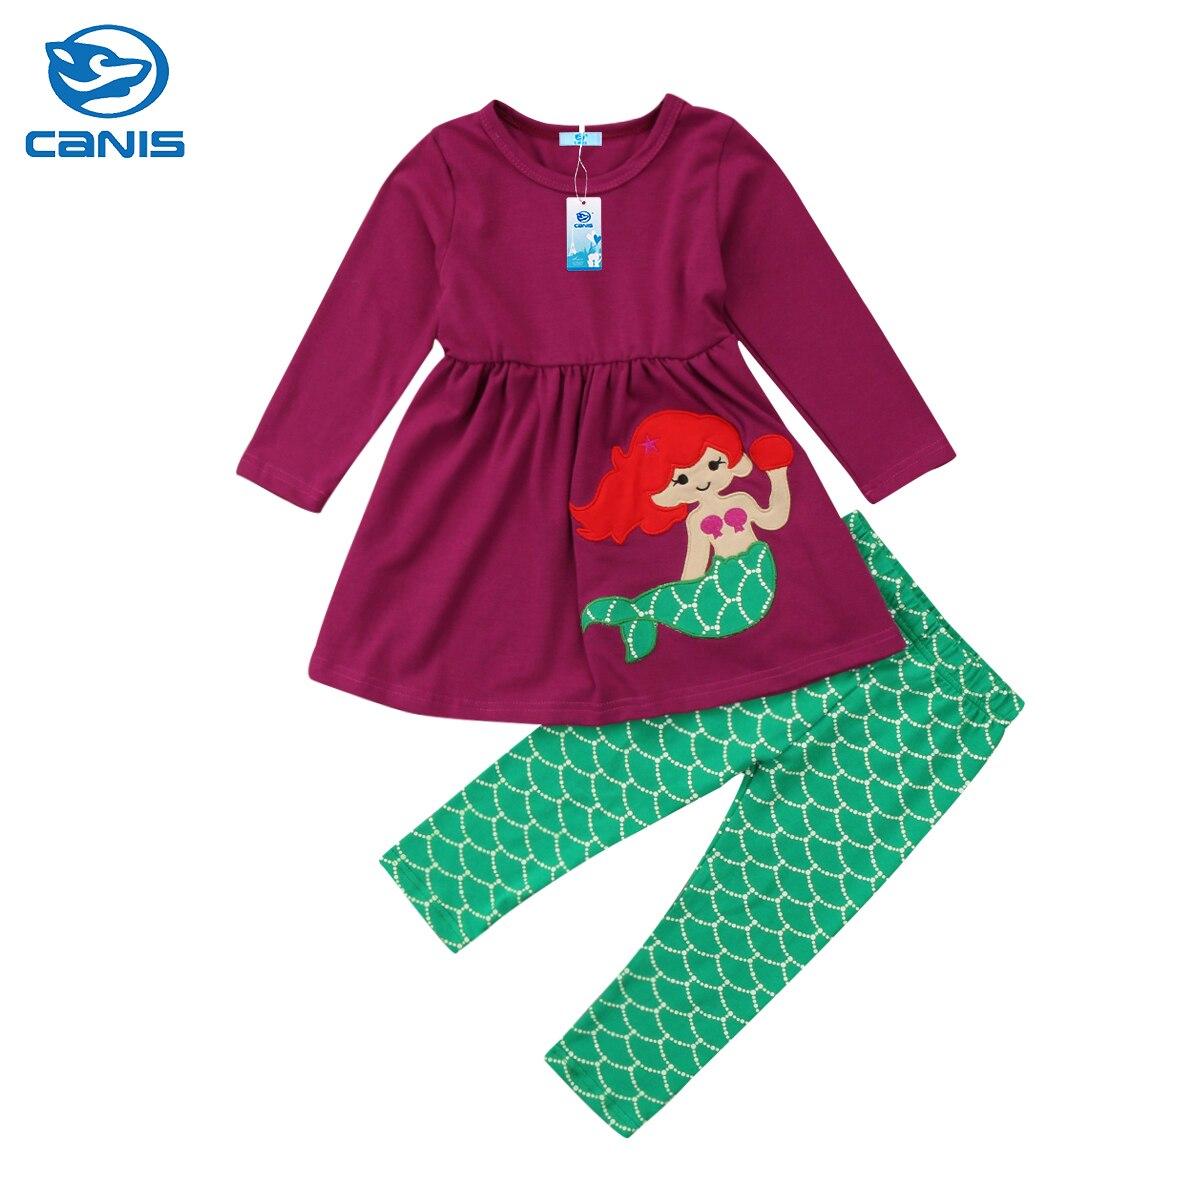 2018 Brand New 2pcs Toddler Infant Child Kid Girls Long Sleeve T-shirt Tops Long Pants Outfits Clothes 2Pcs Mermaid Set 1-6T girls baby long sleeve tops t shirt bib cartoon minnie 2pcs outfits set 1 5y